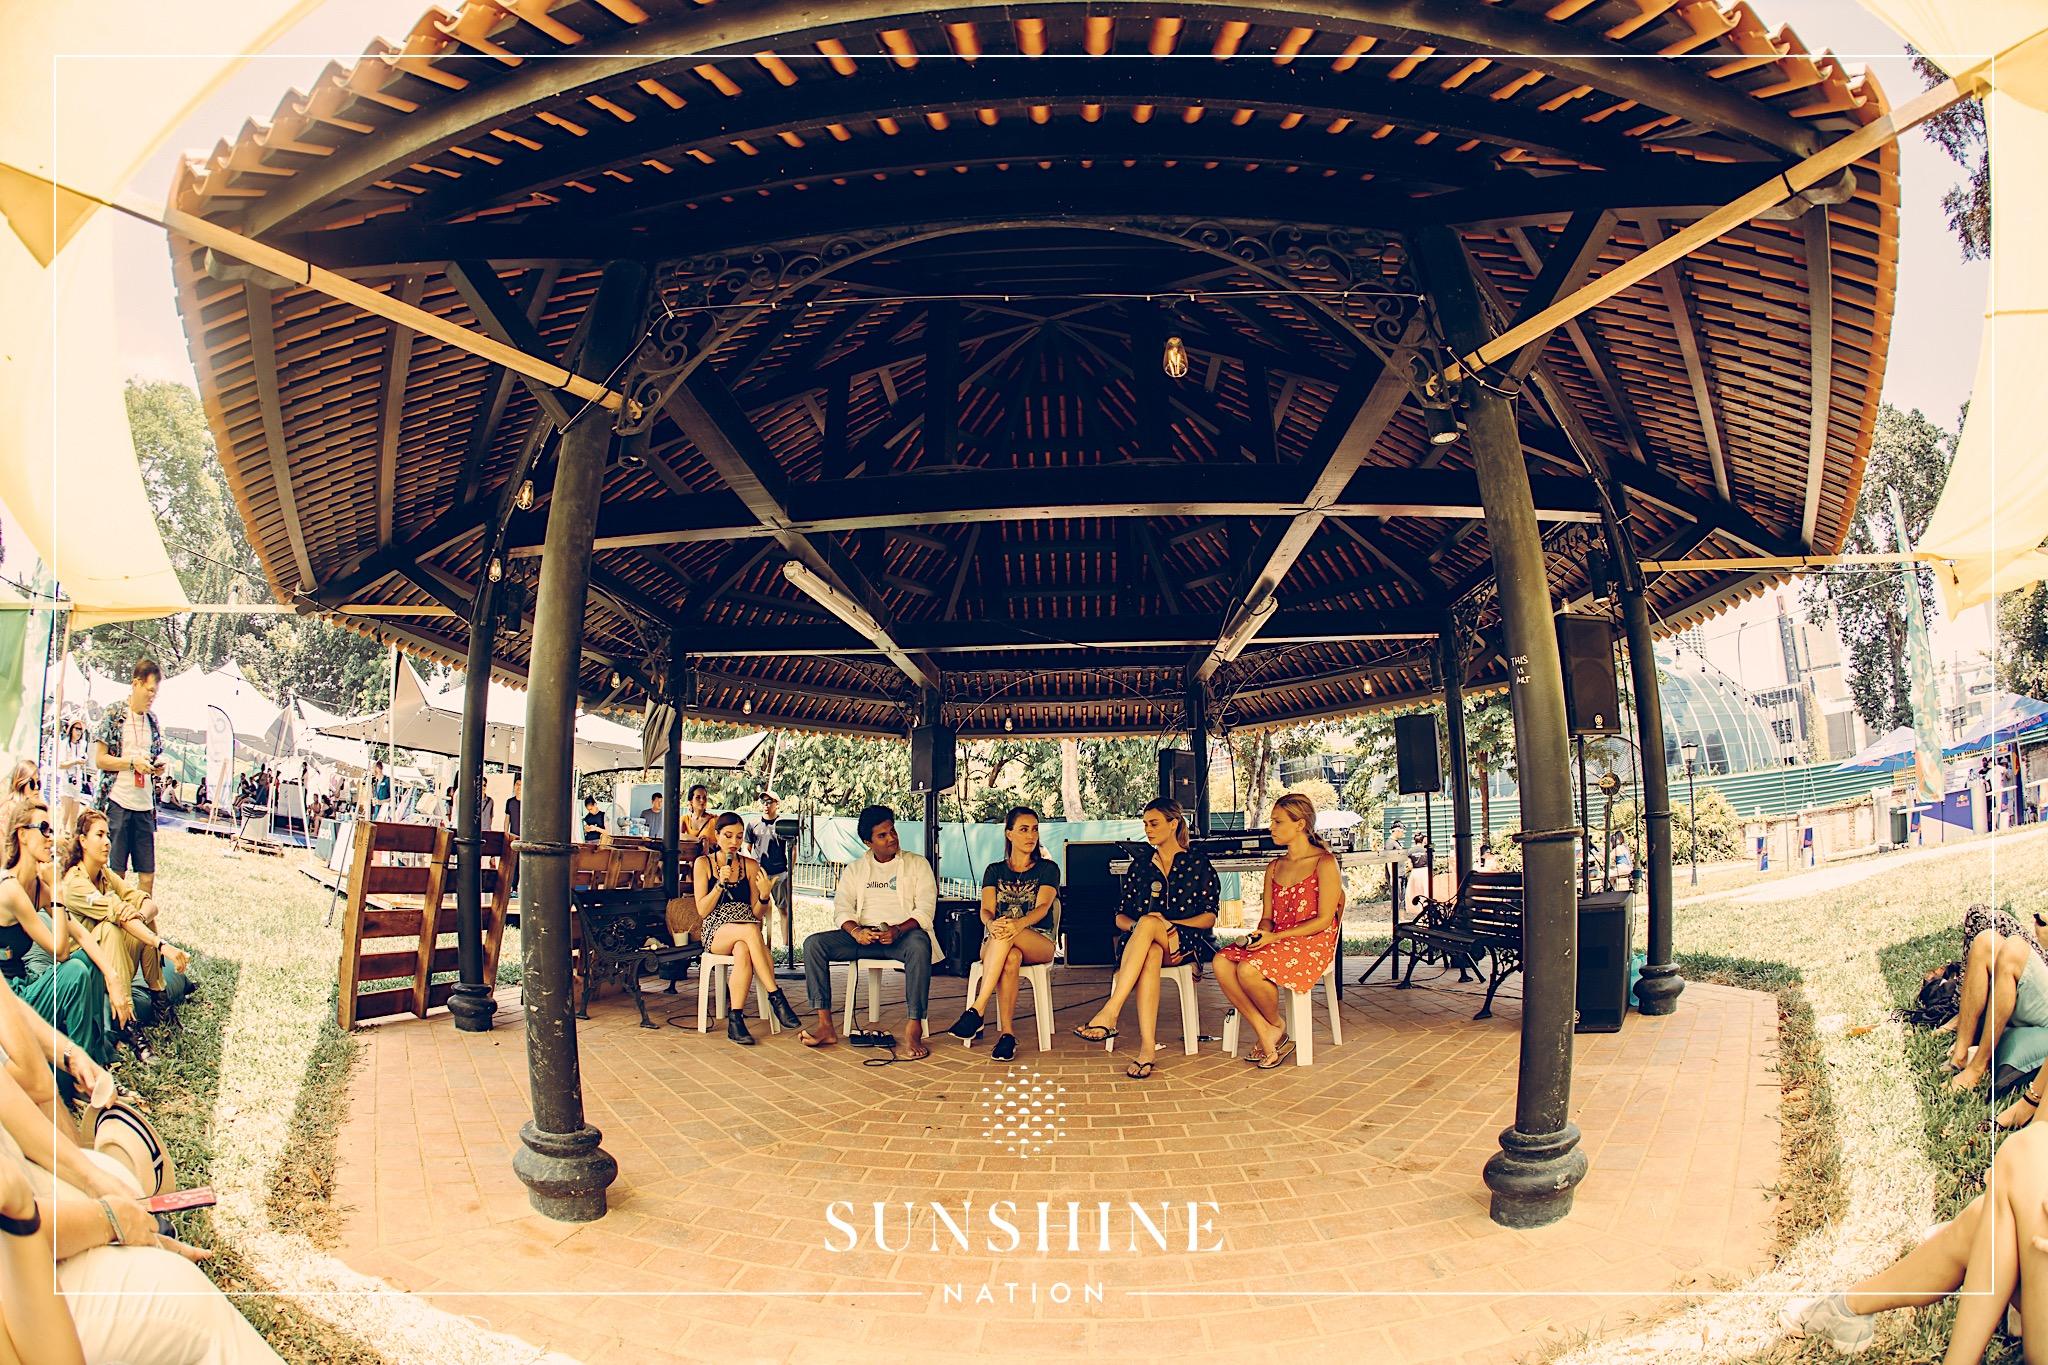 09032019_SunshineNation_Colossal043_Watermarked.jpg